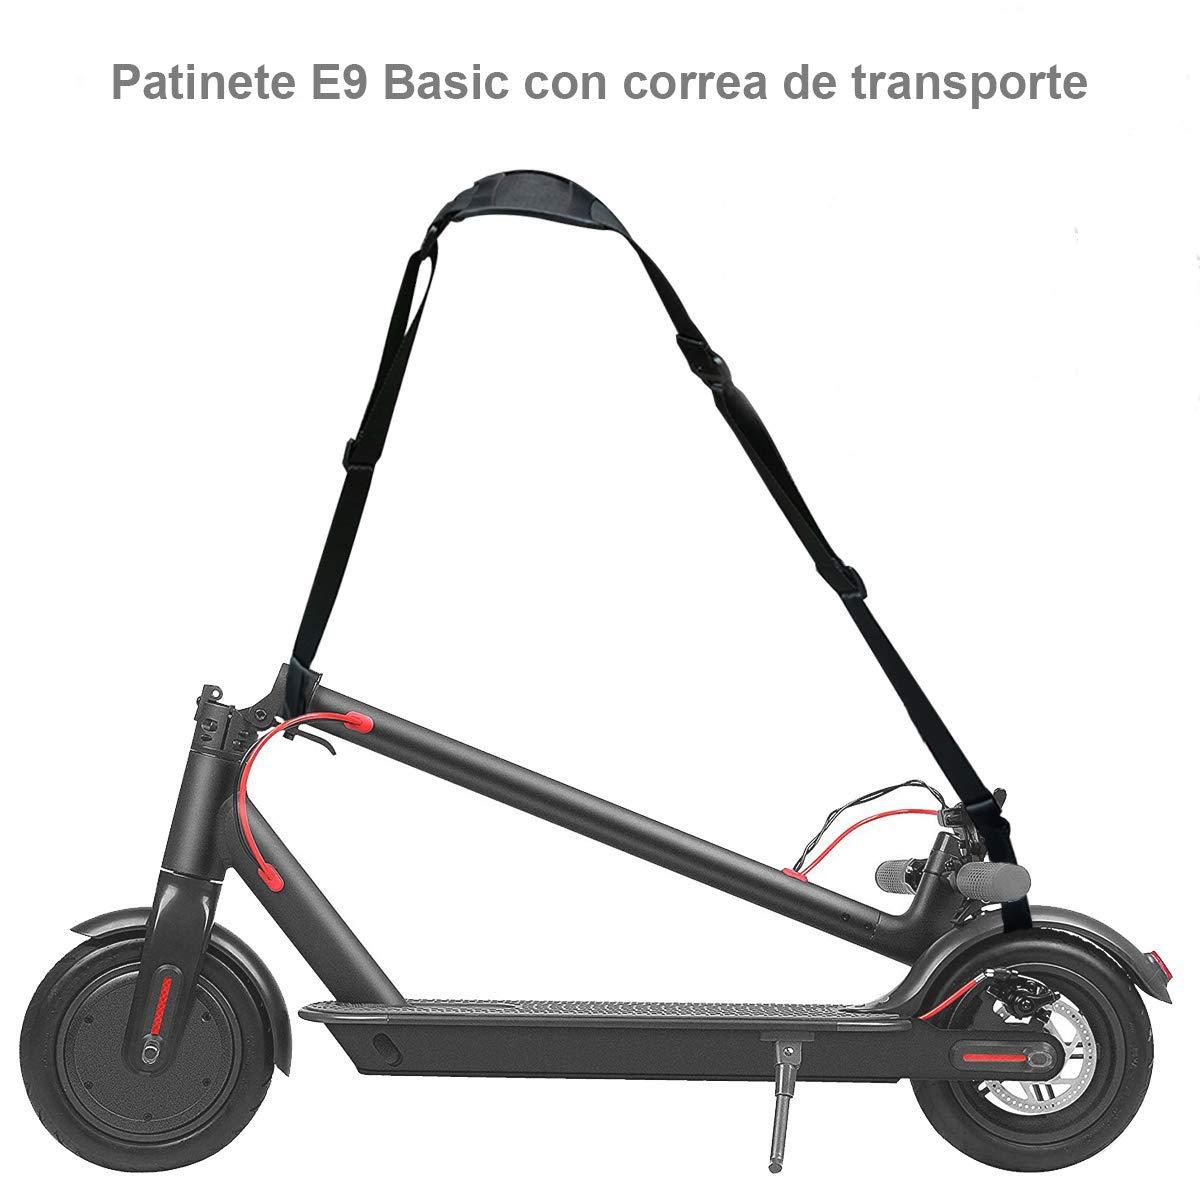 ZWheel Patinete Eléctrico E9 Basic ZLion 25 km/h 300W Motor Patinete eléctrico con Accesorios…